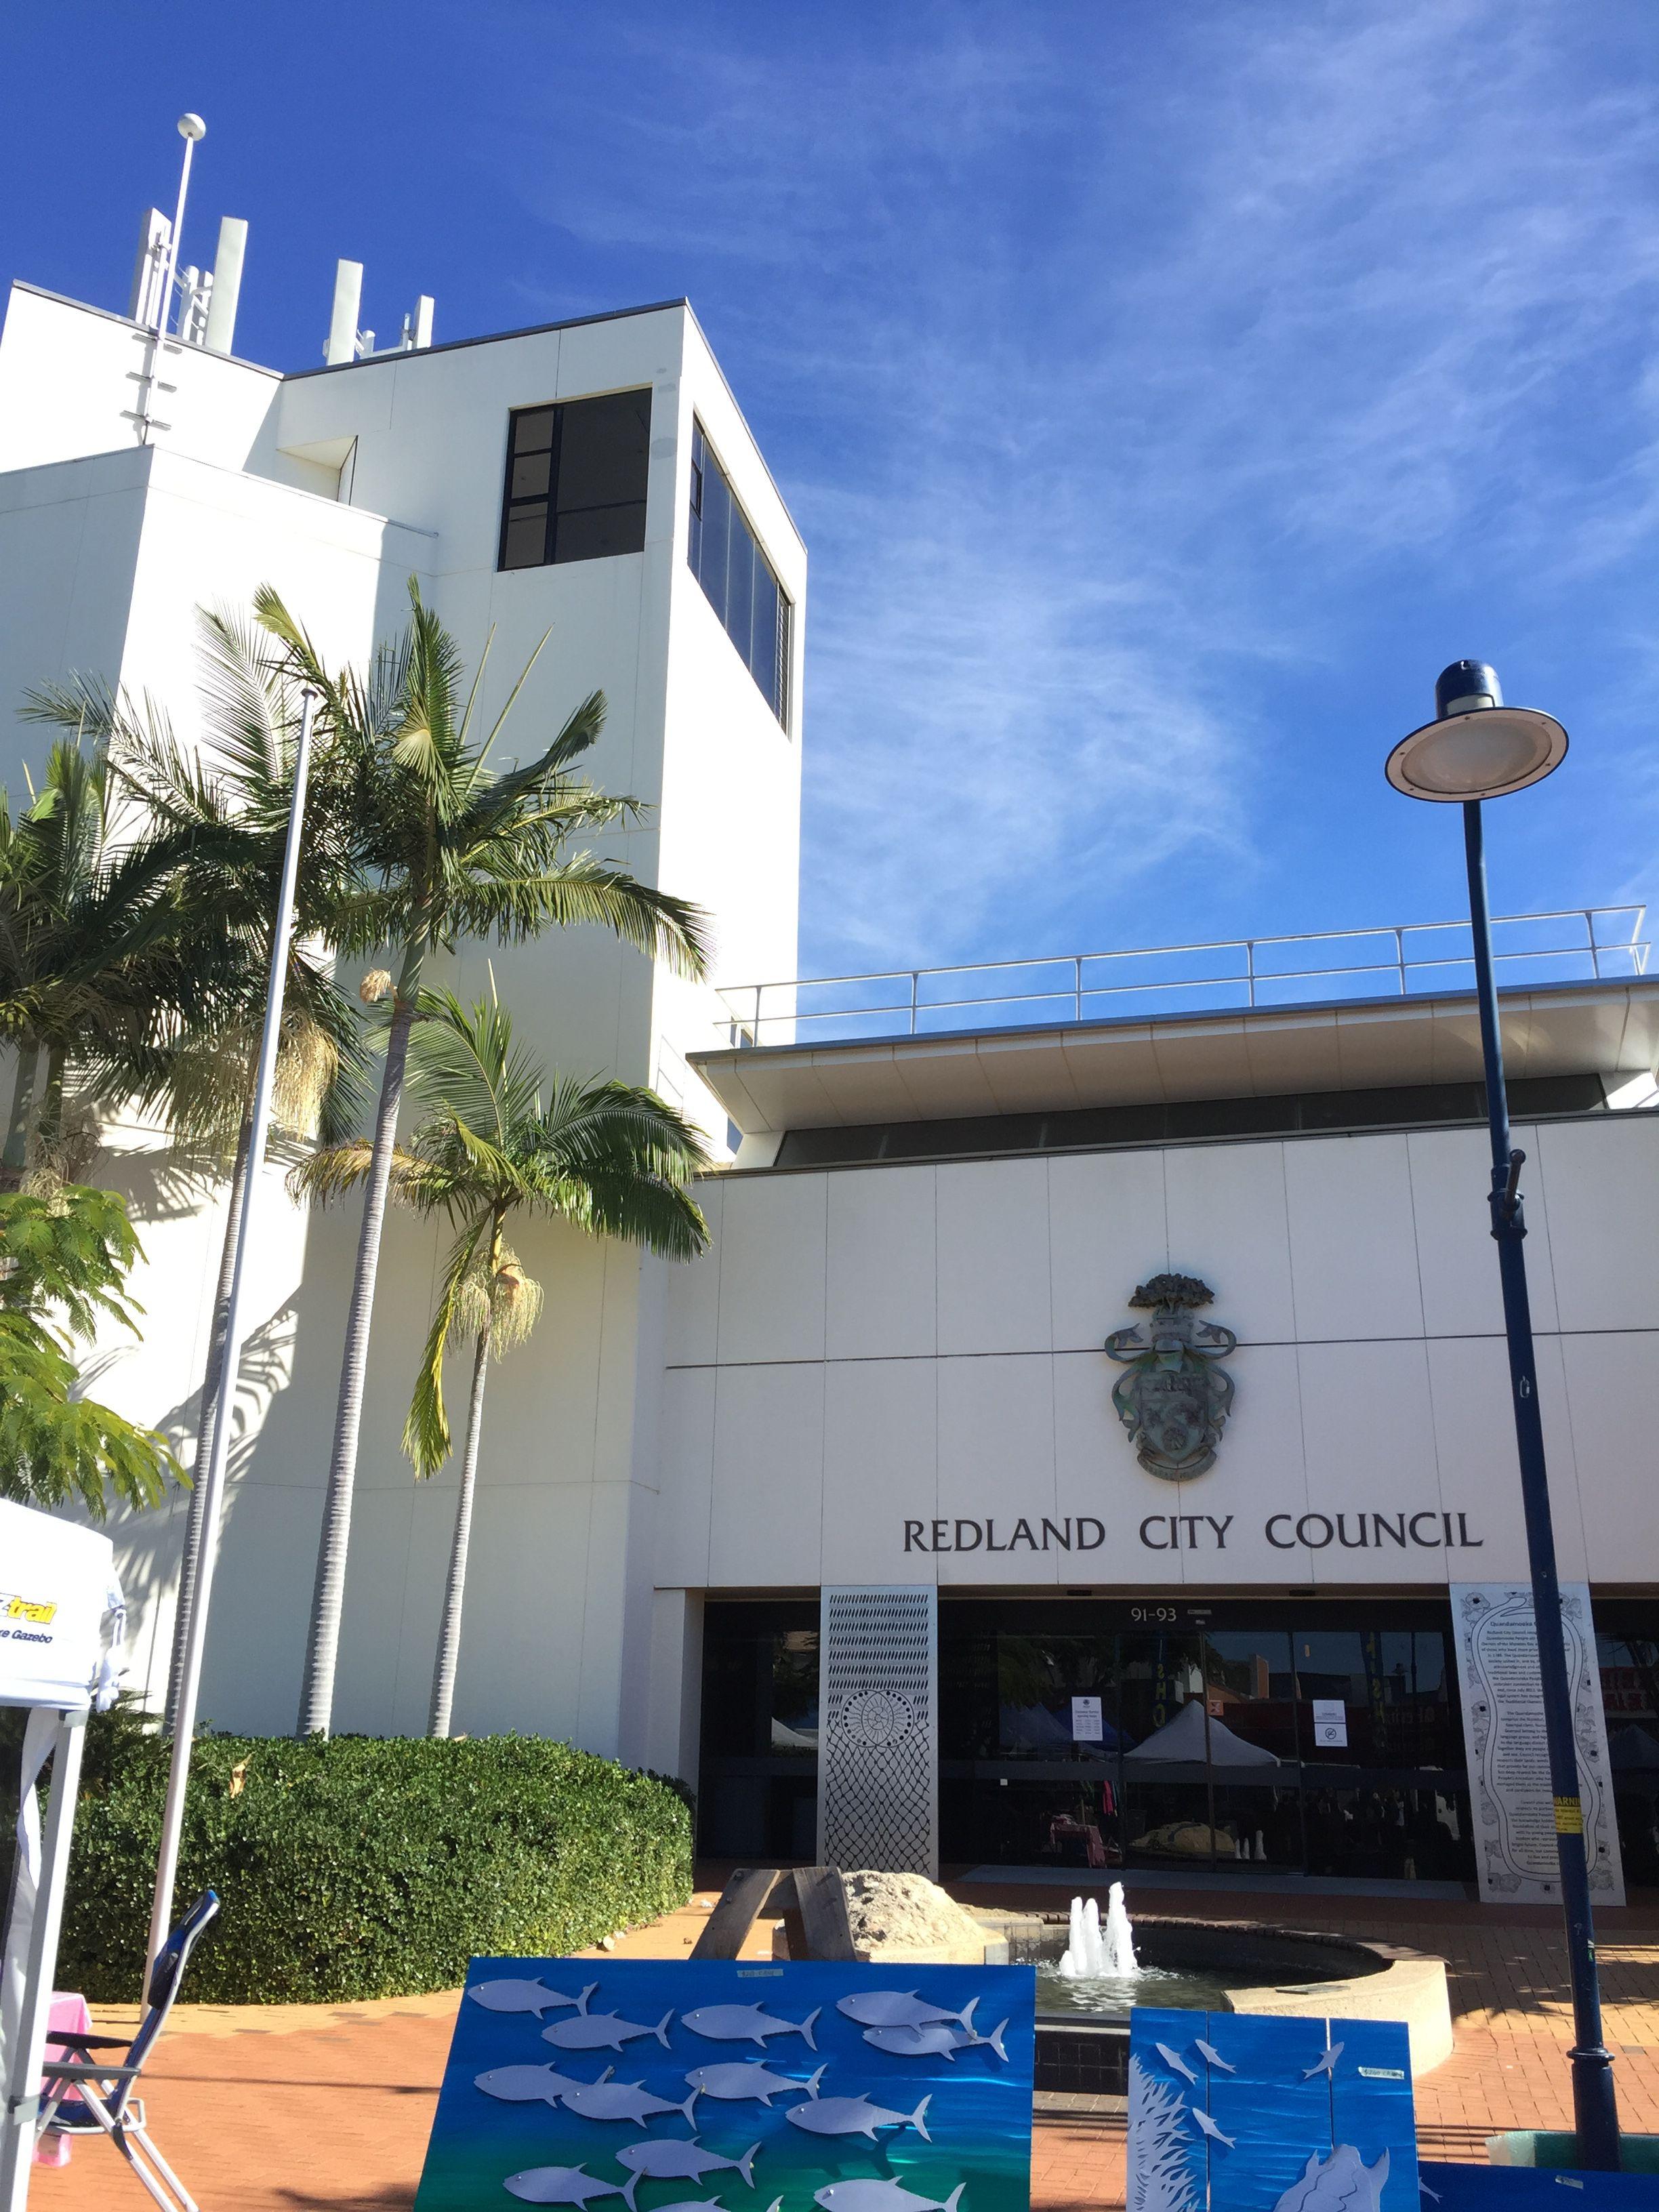 Nopeus dating Redlands QLD